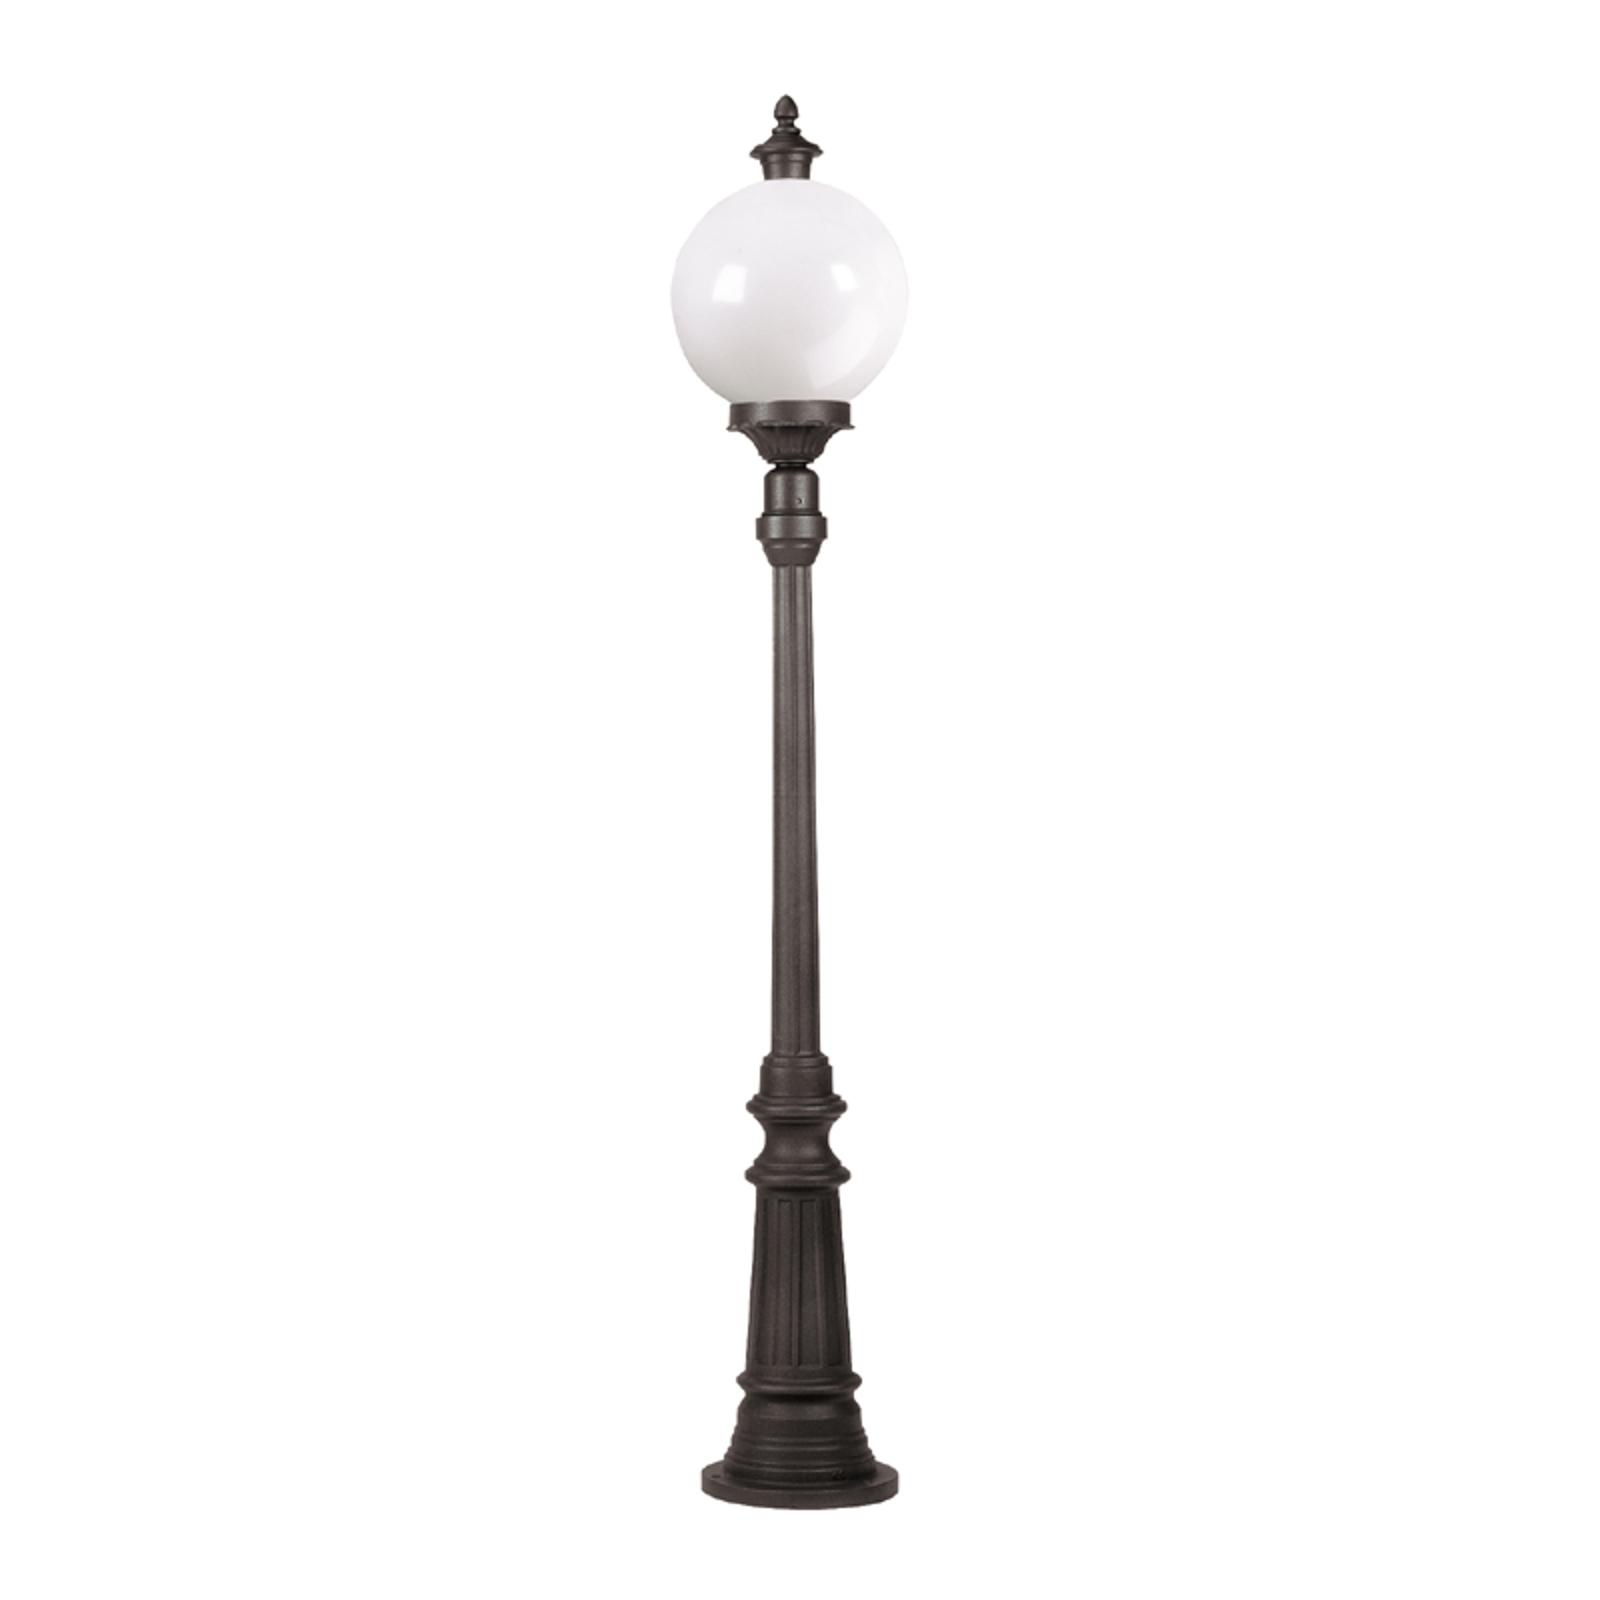 Lampadaire Madeira à 1 lampe anthracite